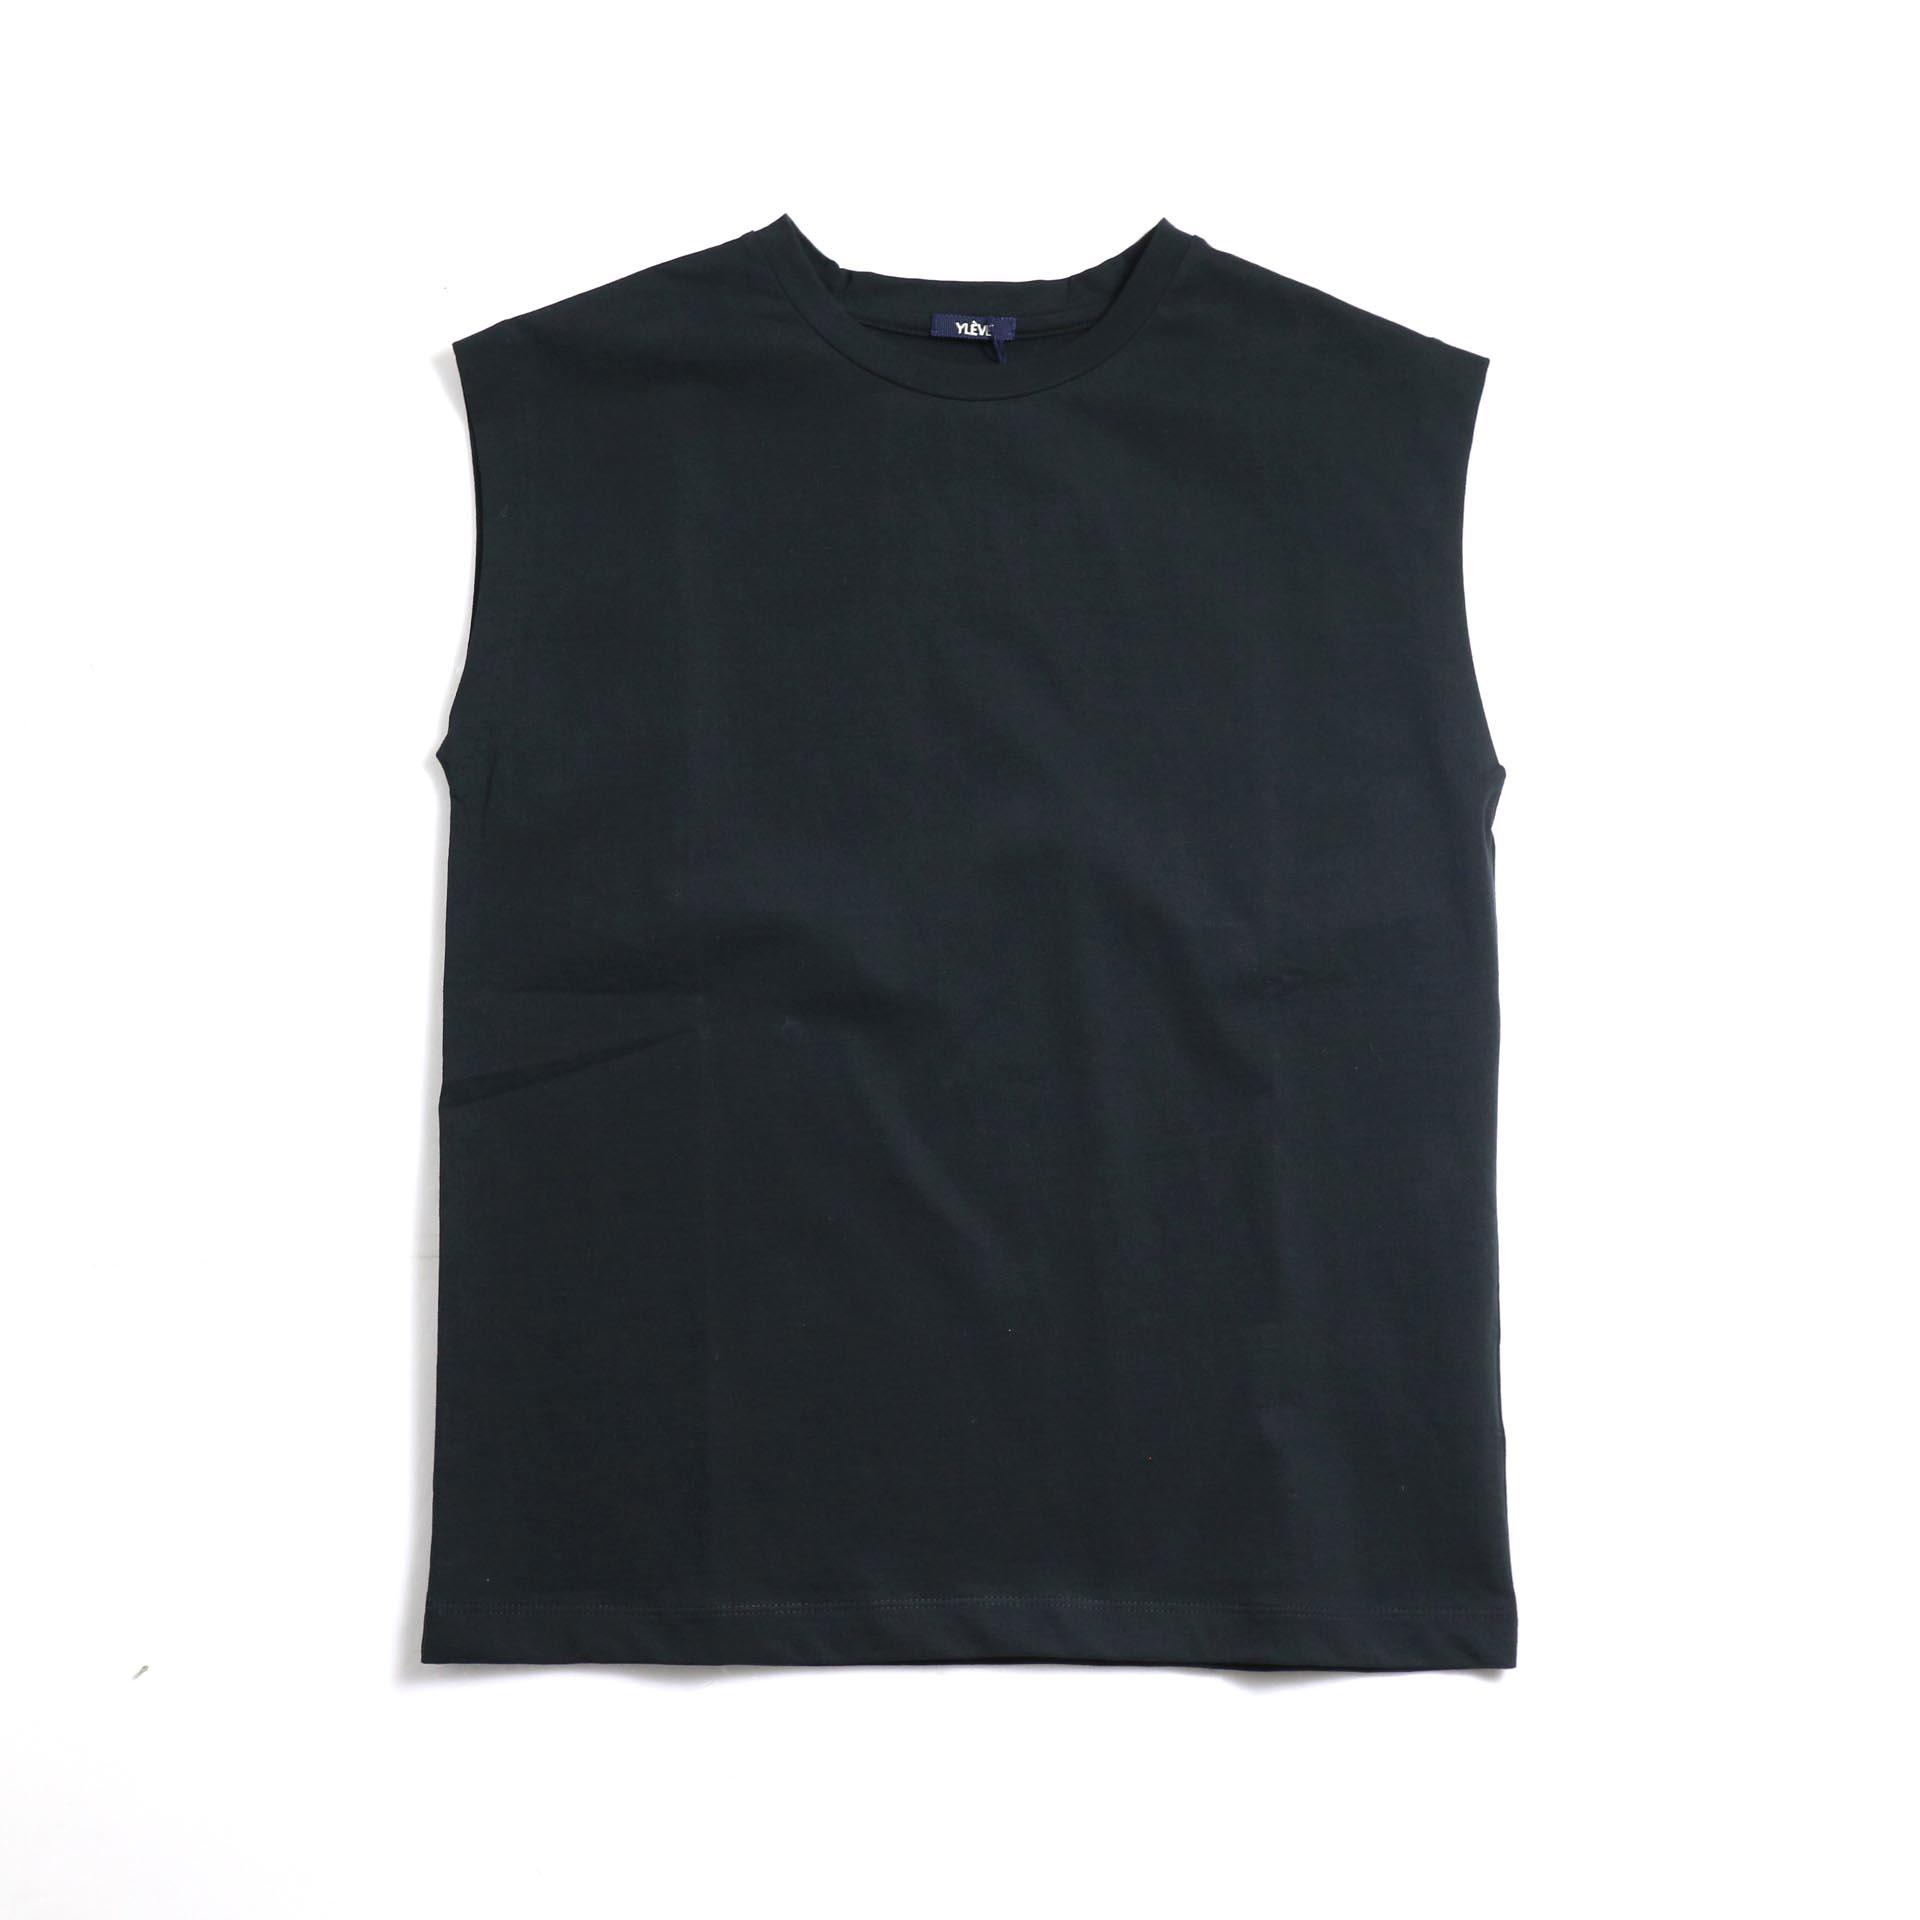 YLEVE / Organic Cotton Bio N/S -Black